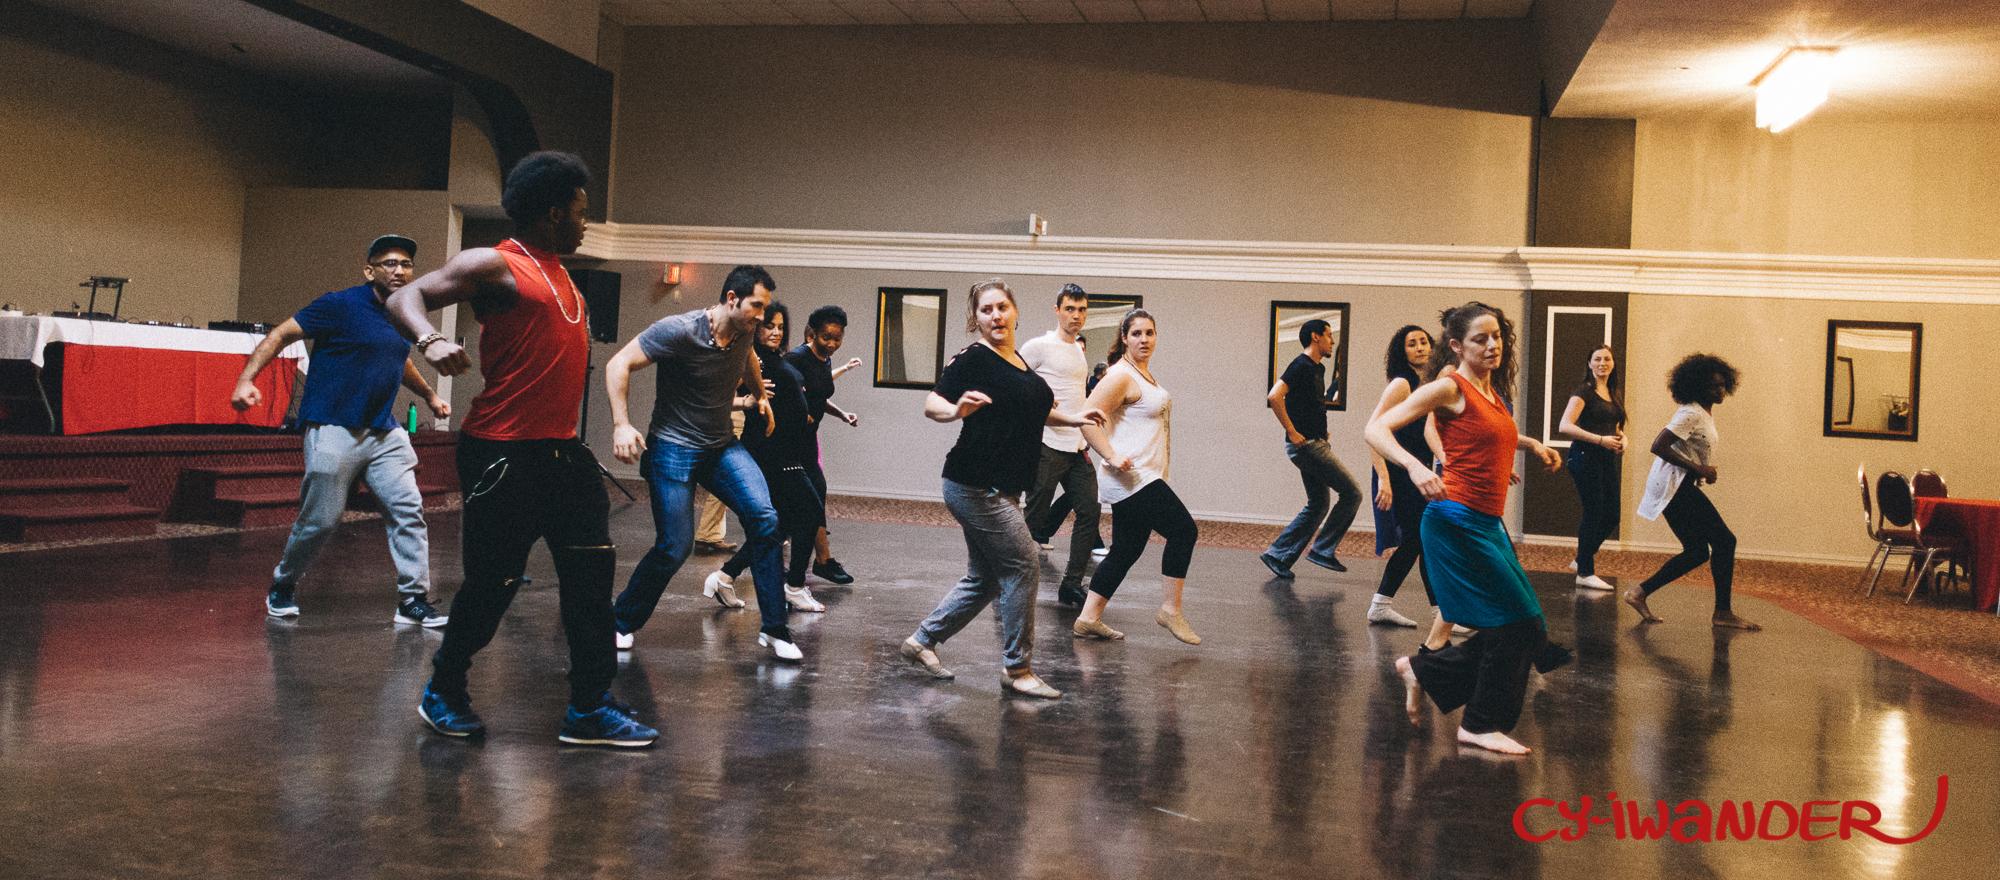 bailando cy-iwander-8770.jpg